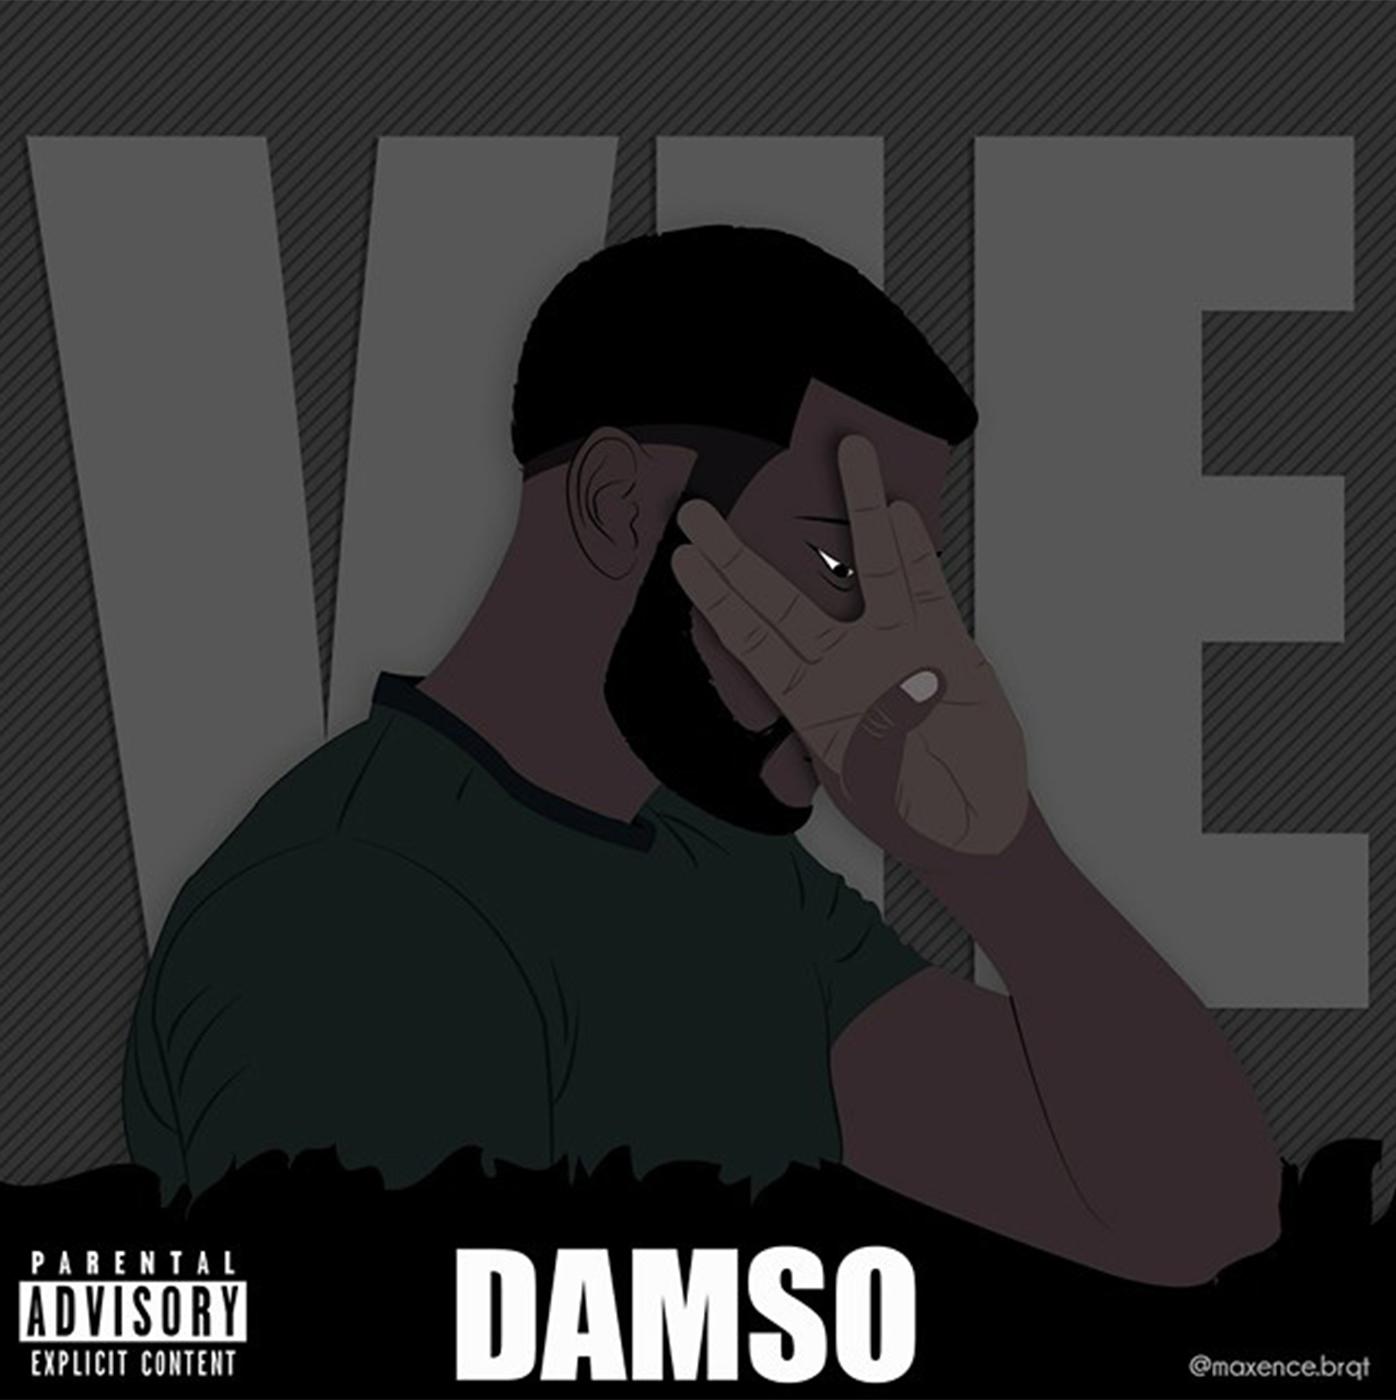 Graphisme - Damso